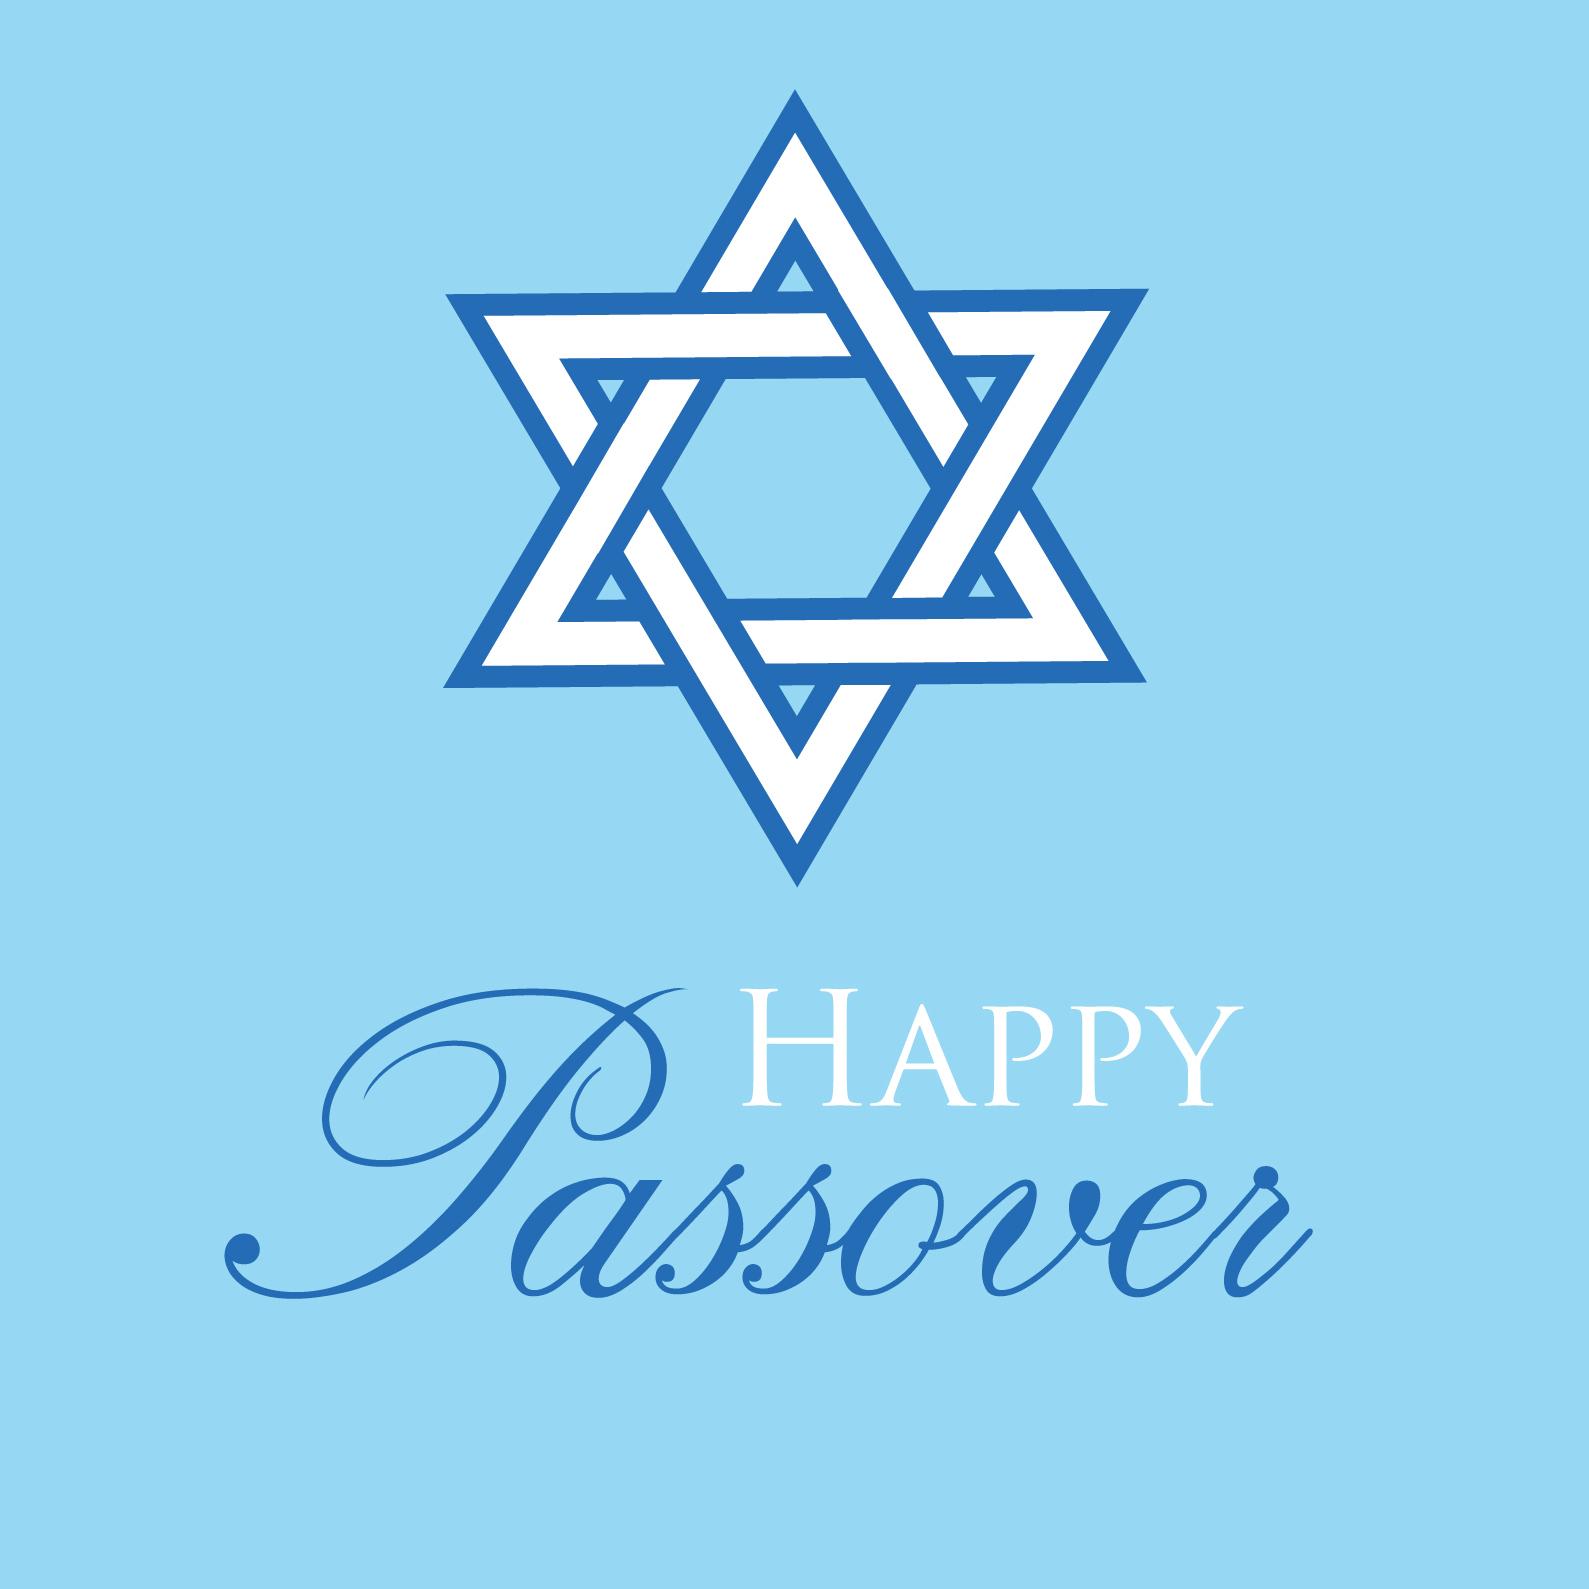 Passover greeting card by Ananya